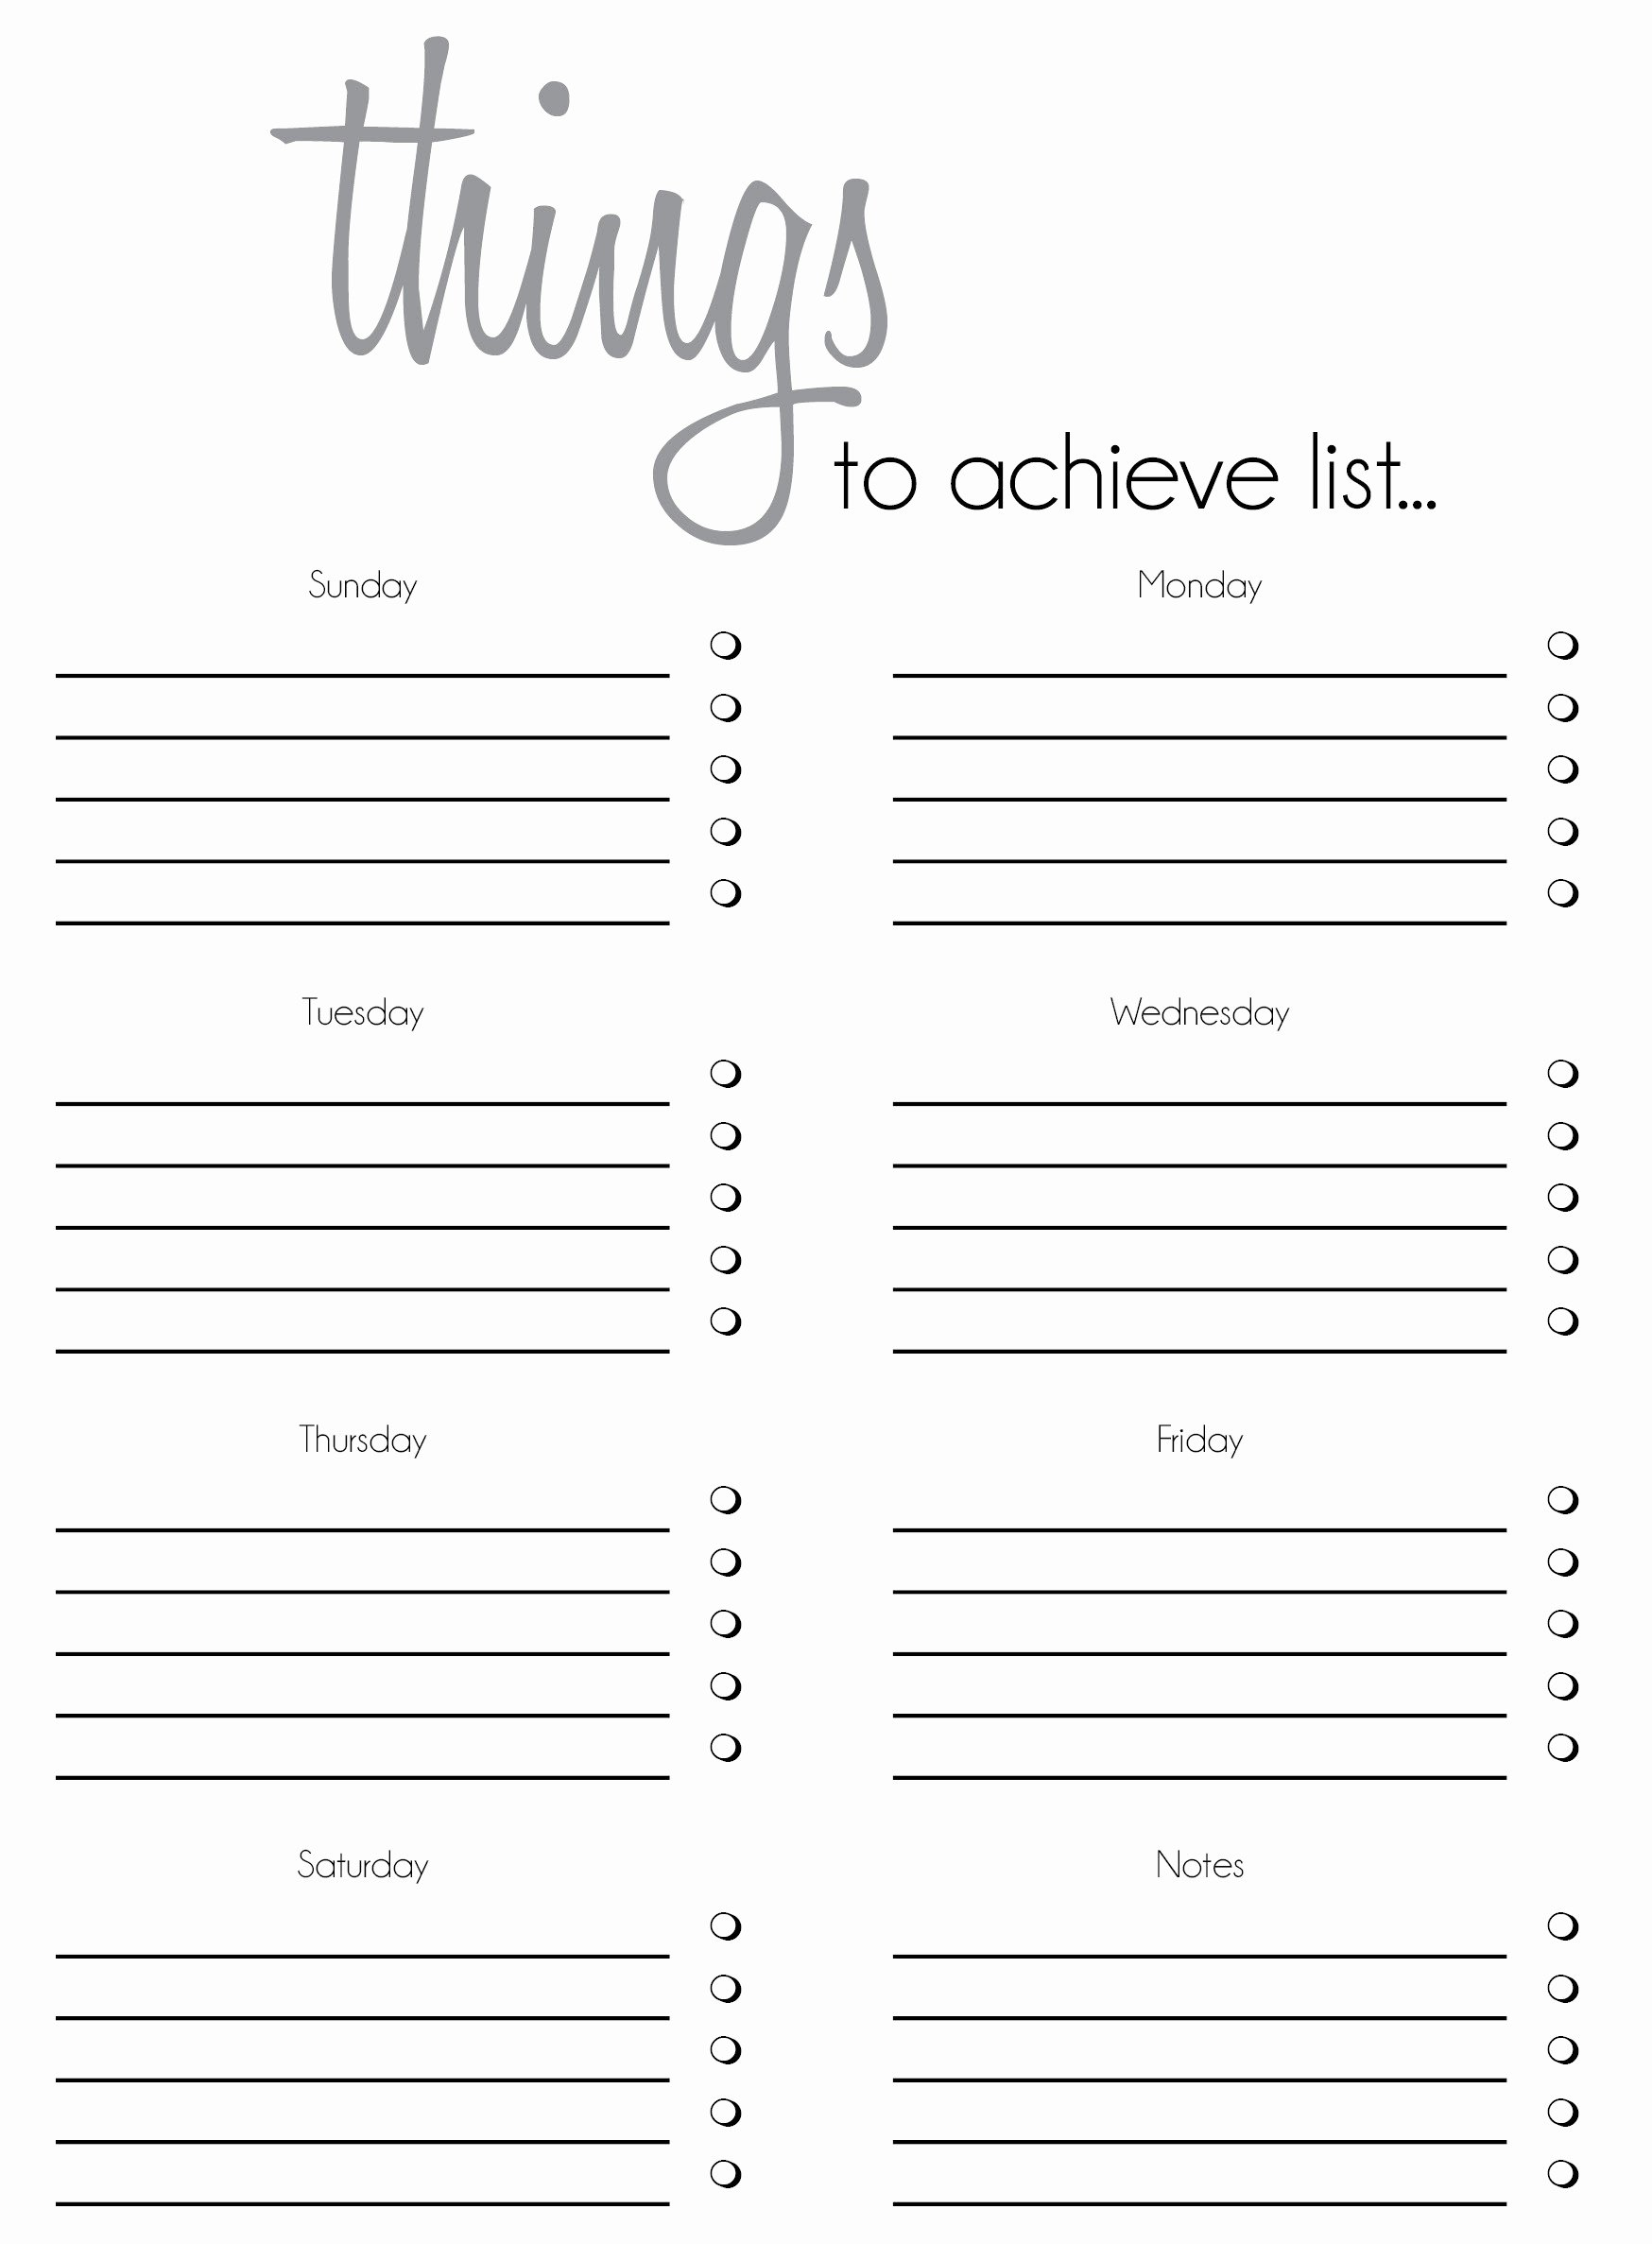 Todo List Template Word Inspirational Free Printable to Do List Templates